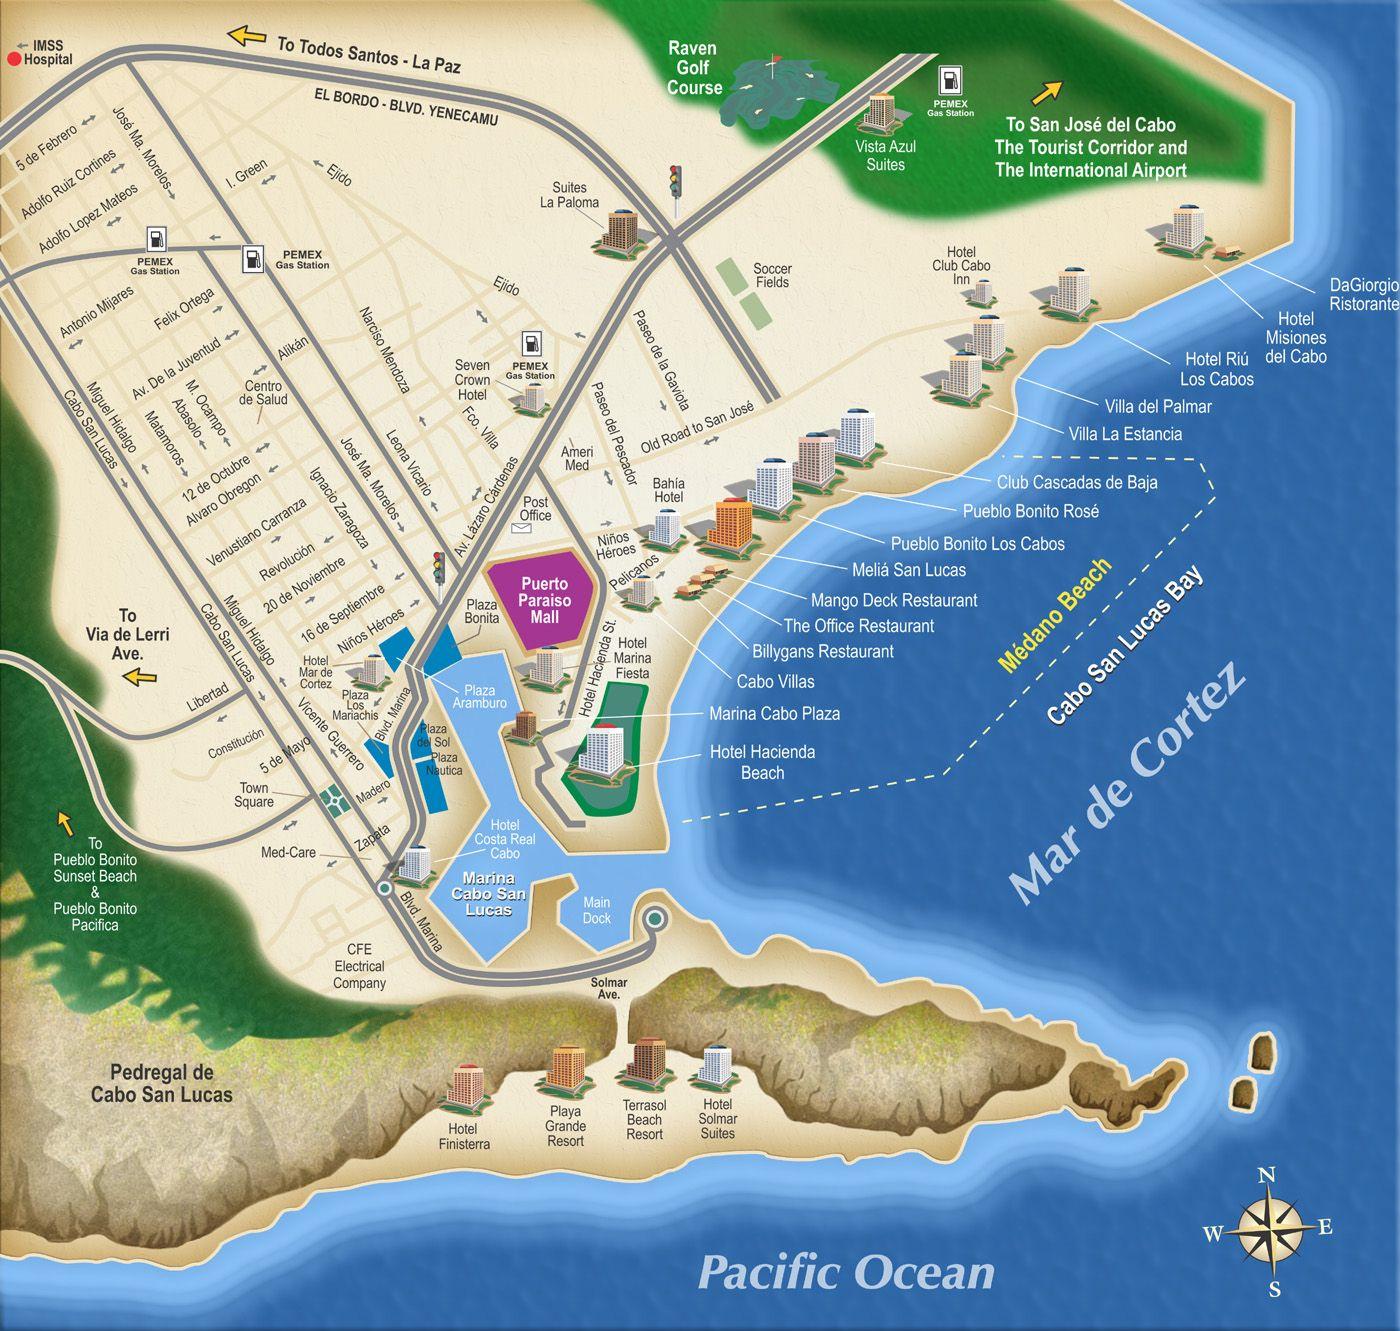 Pin by SouthWest Sportsmen on I MAPS in 2019 | Cabo san ... Cabo San Lucas Maps on ciudad juarez map, riu palace cabo resort map, isla mujeres map, los cabos map, nuevo vallarta map, los barriles map, sea of cortez map, north america map, punta cana map, villa la estancia cabo map, new york city map, la paz map, baja map, ensenada map, puerto vallarta map, cancun map, playa del carmen map, huatulco map, st. thomas map, jamaica map,